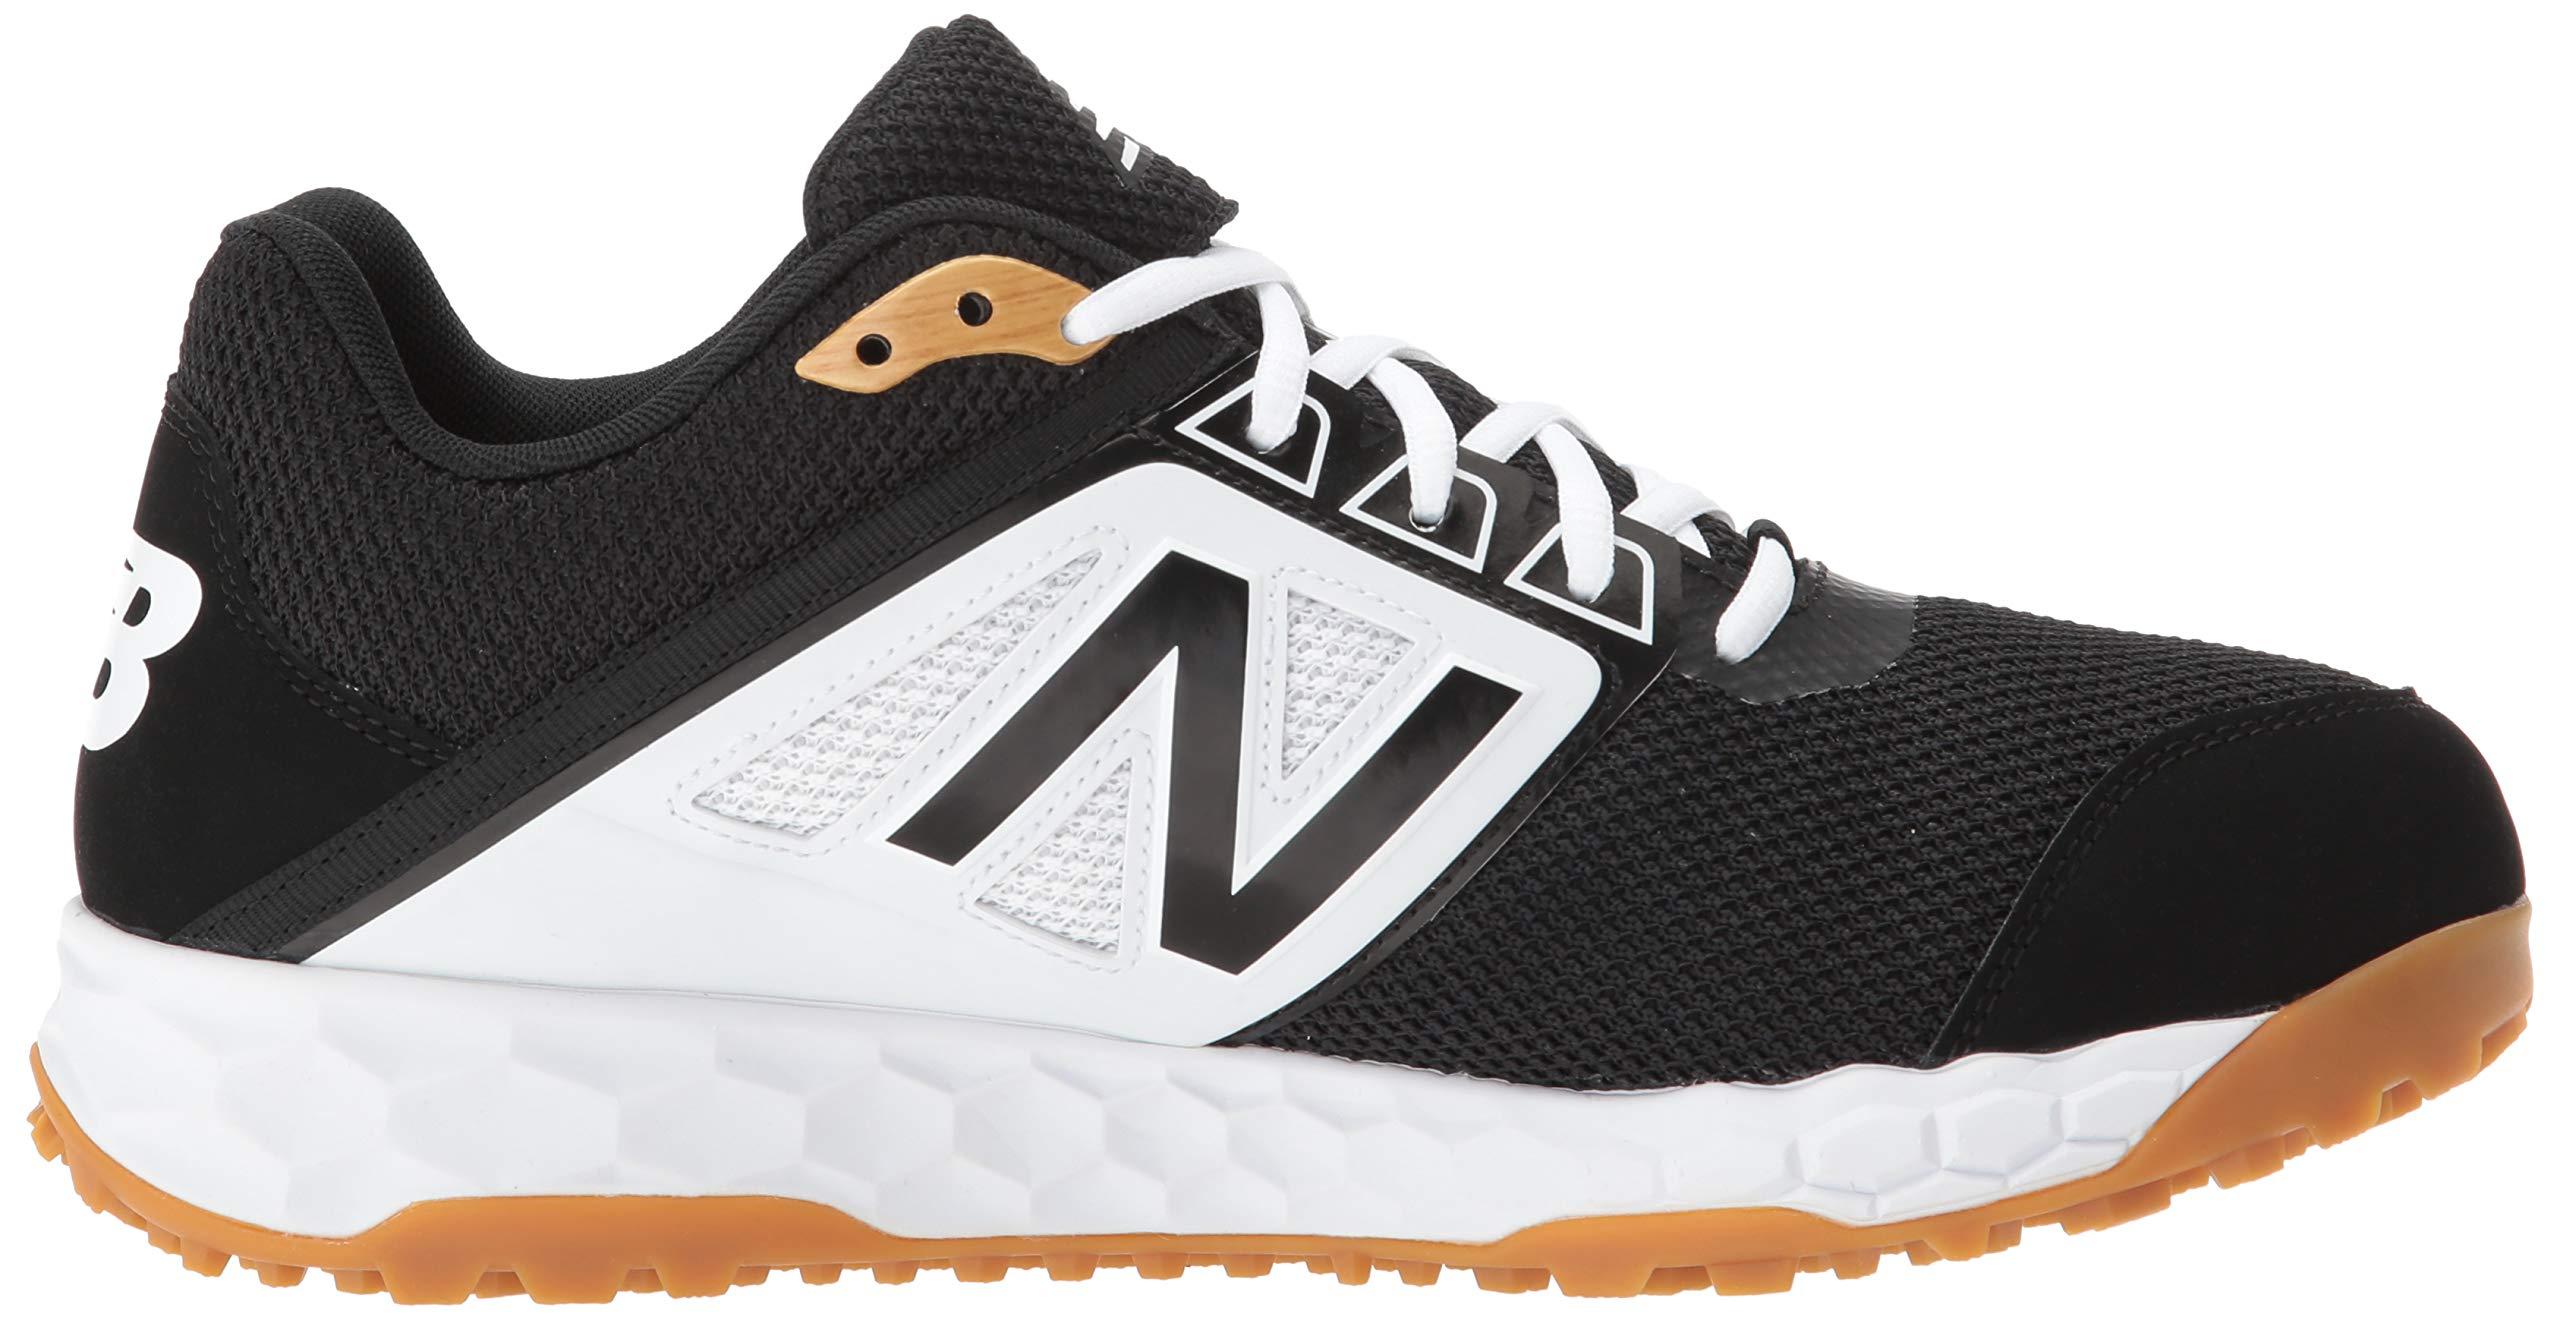 New Balance Men's 3000v4 Turf Baseball Shoe, Black/White, 5 D US by New Balance (Image #7)